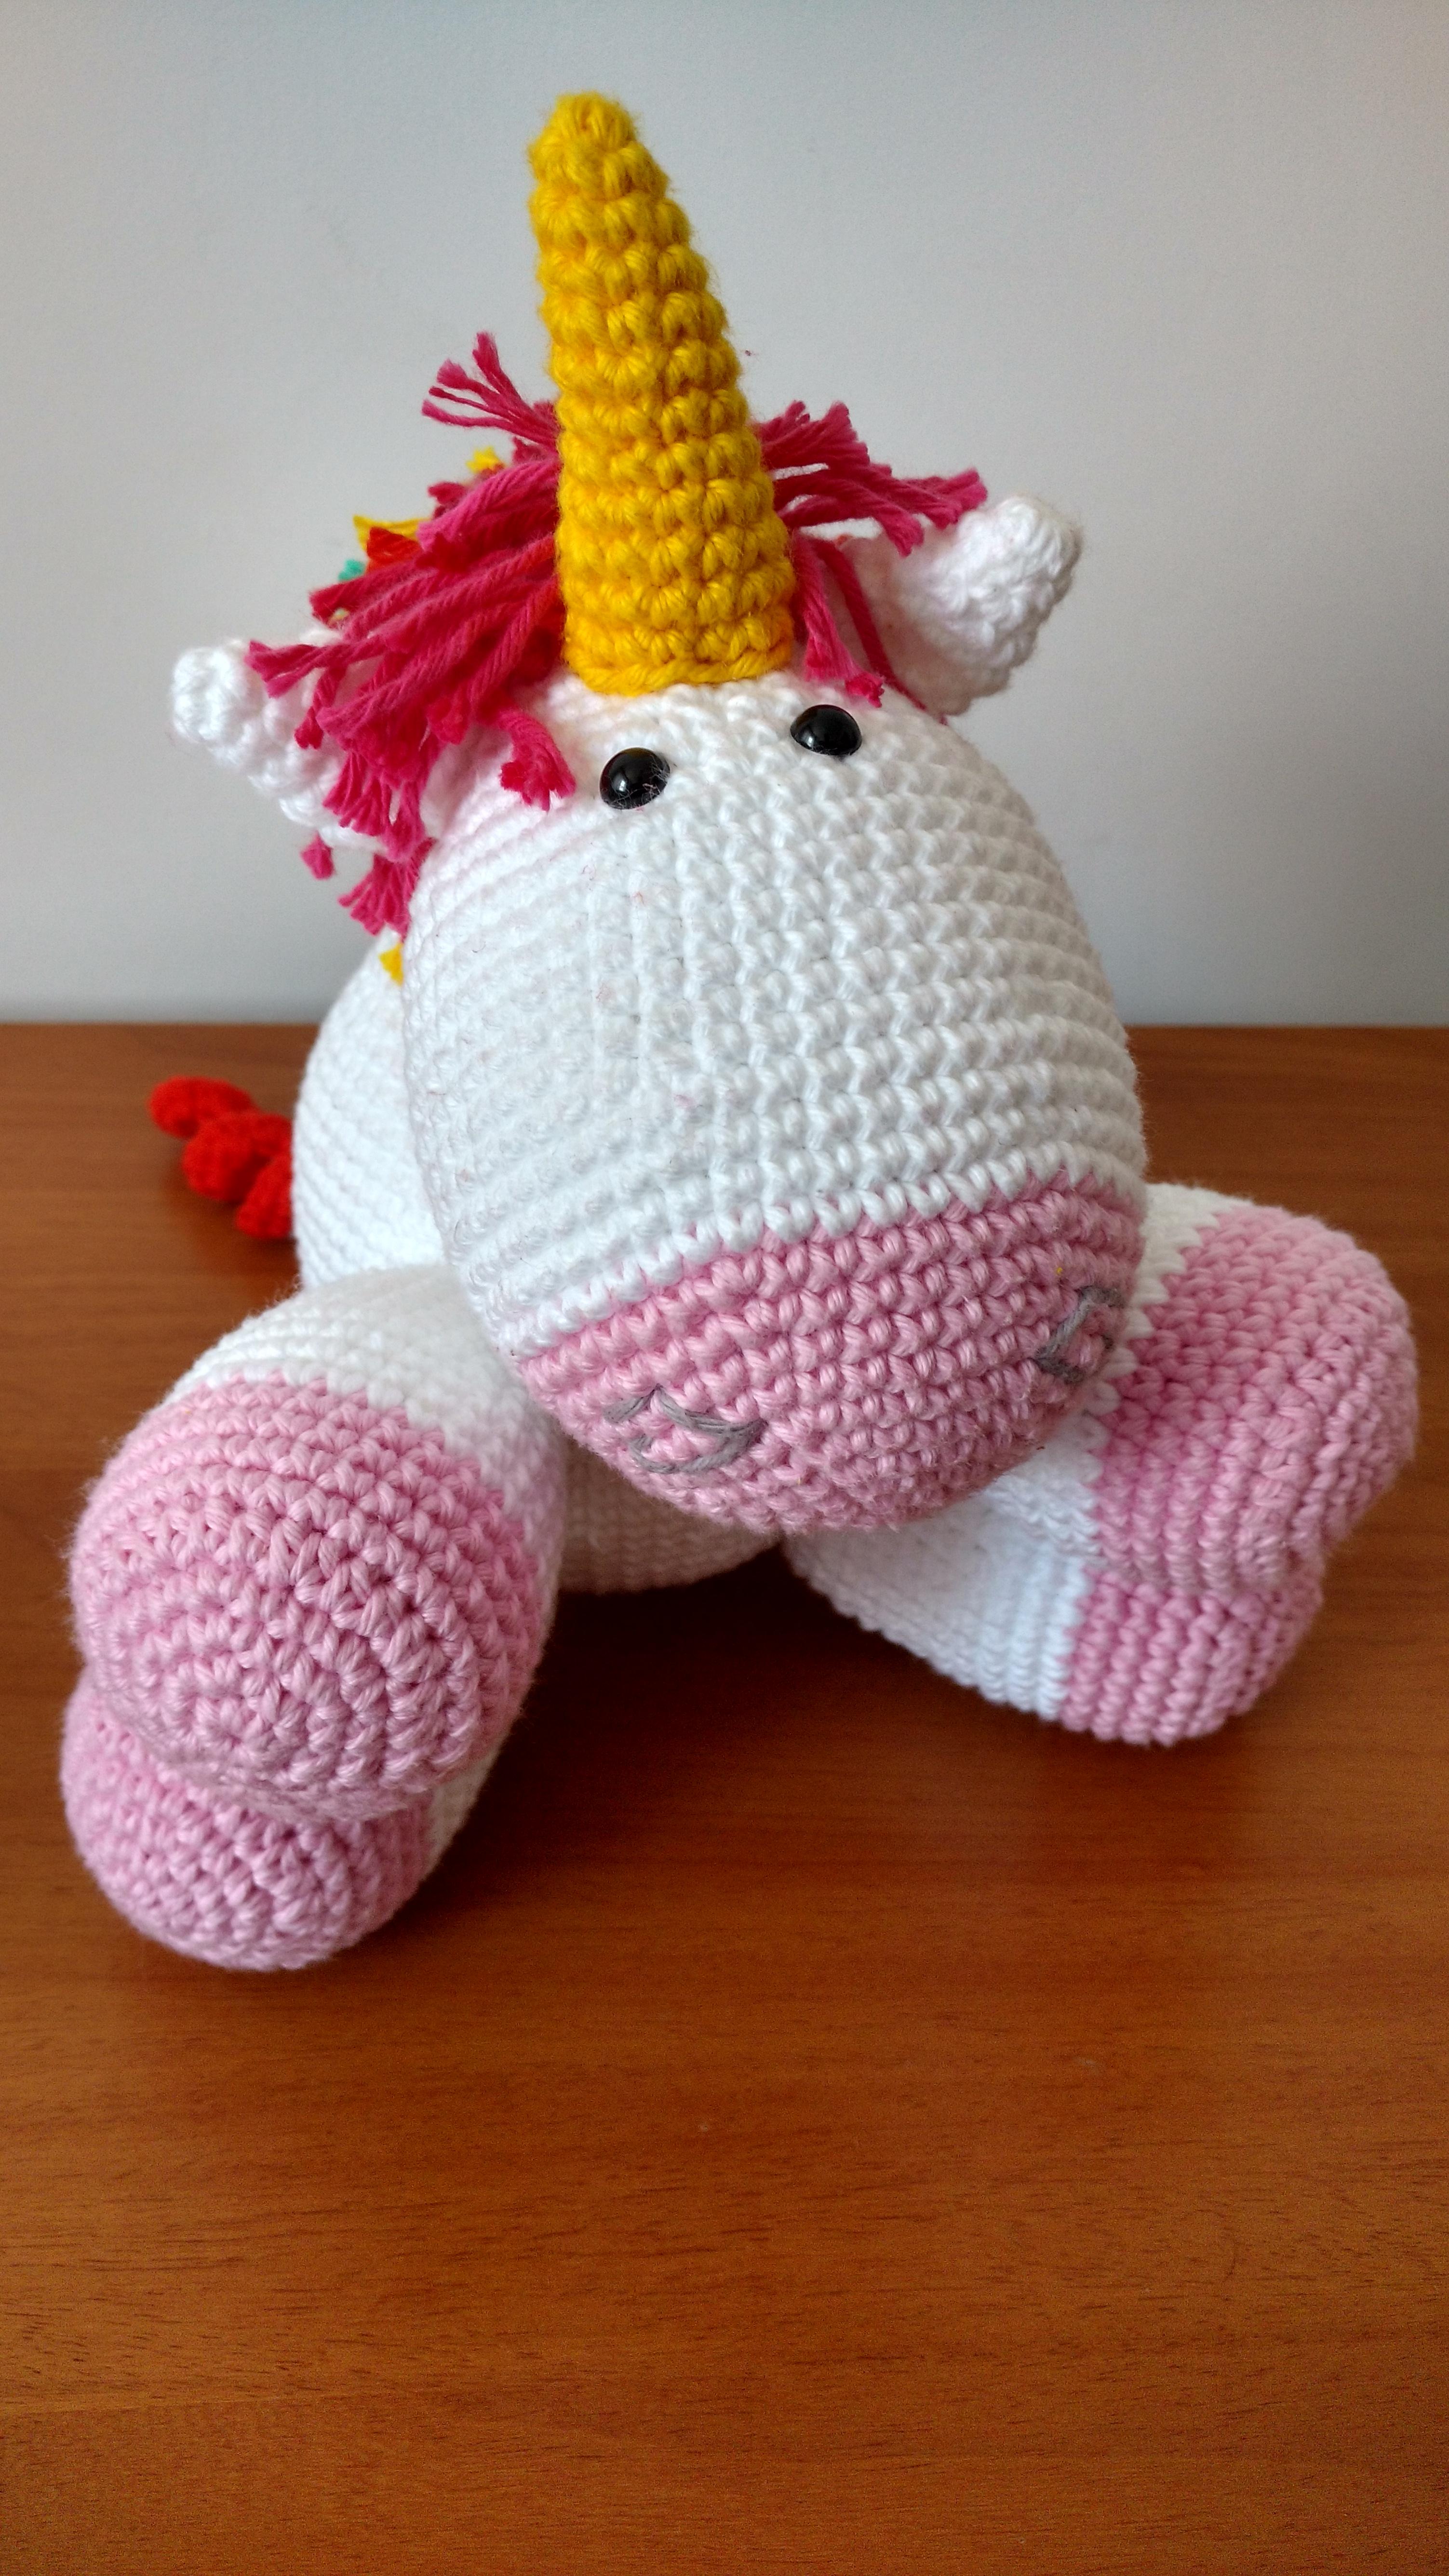 Crochet Pattern: Lil' Fluffy Unicorn (Despicable Me) | Crochet ... | 5344x3006